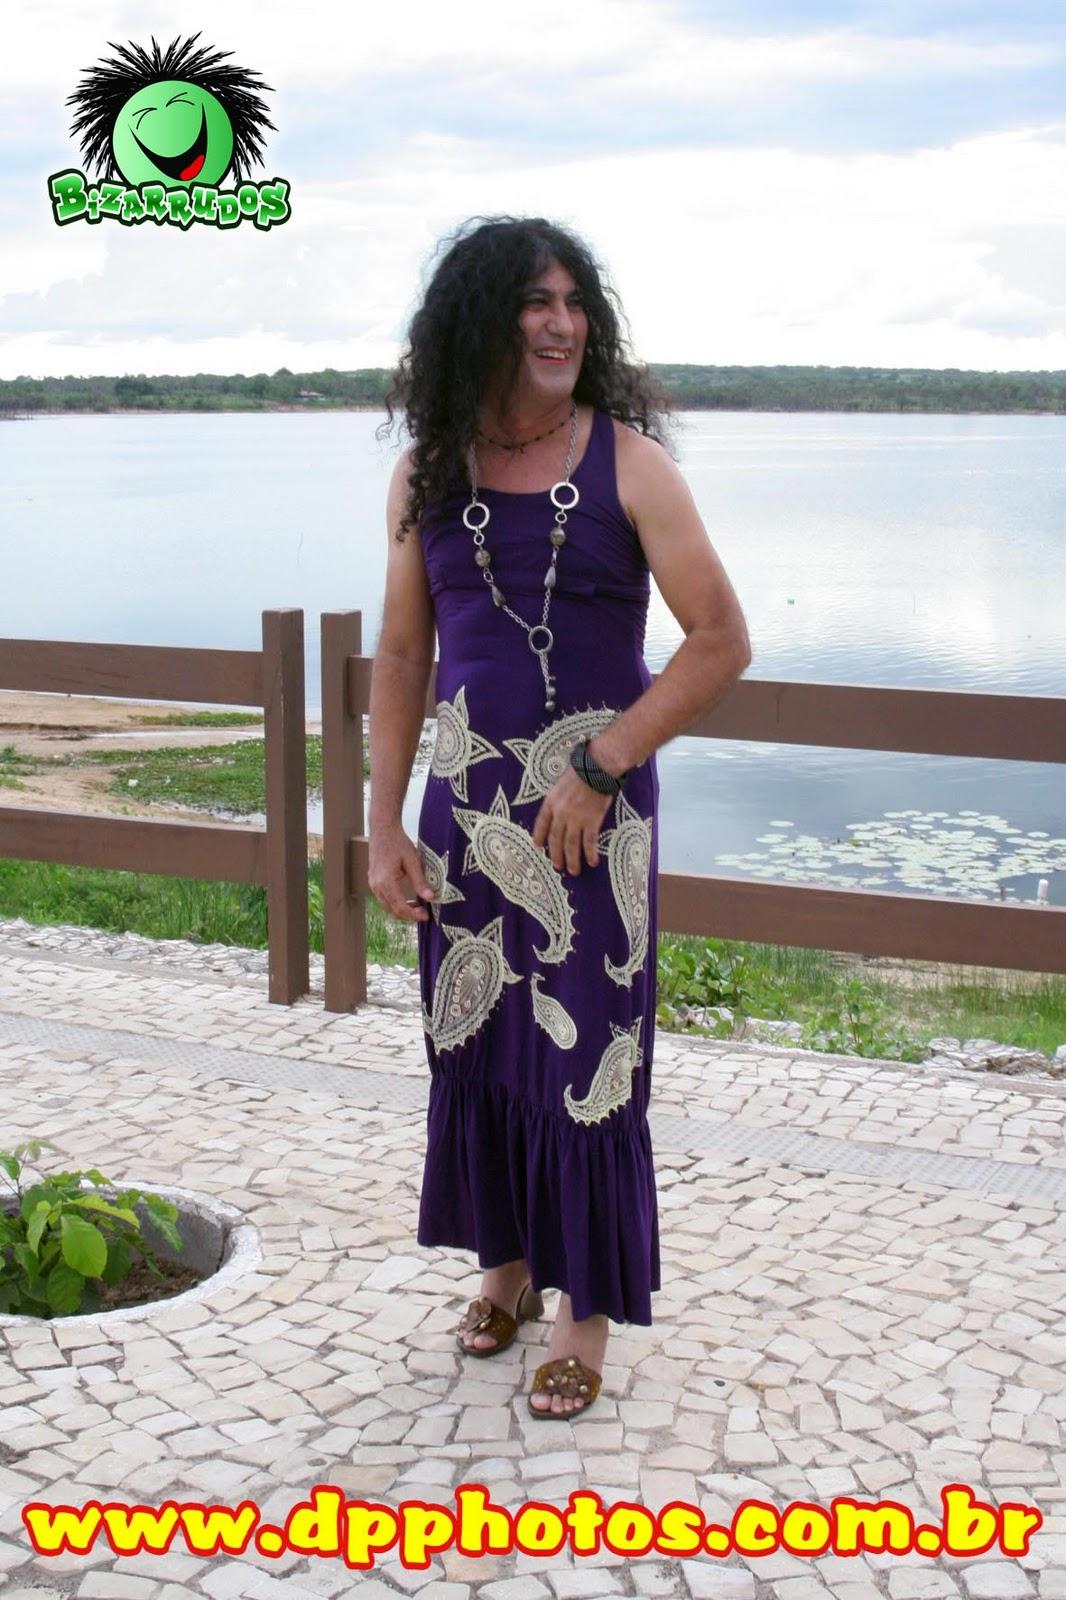 http://4.bp.blogspot.com/___S3Yw6Ak2U/TUncjGiv0nI/AAAAAAAAABQ/KSJenjOiHrw/s1600/Diom%252B%25C2%25AEdio+Paiva+-+biza.+%252857%2529.JPG